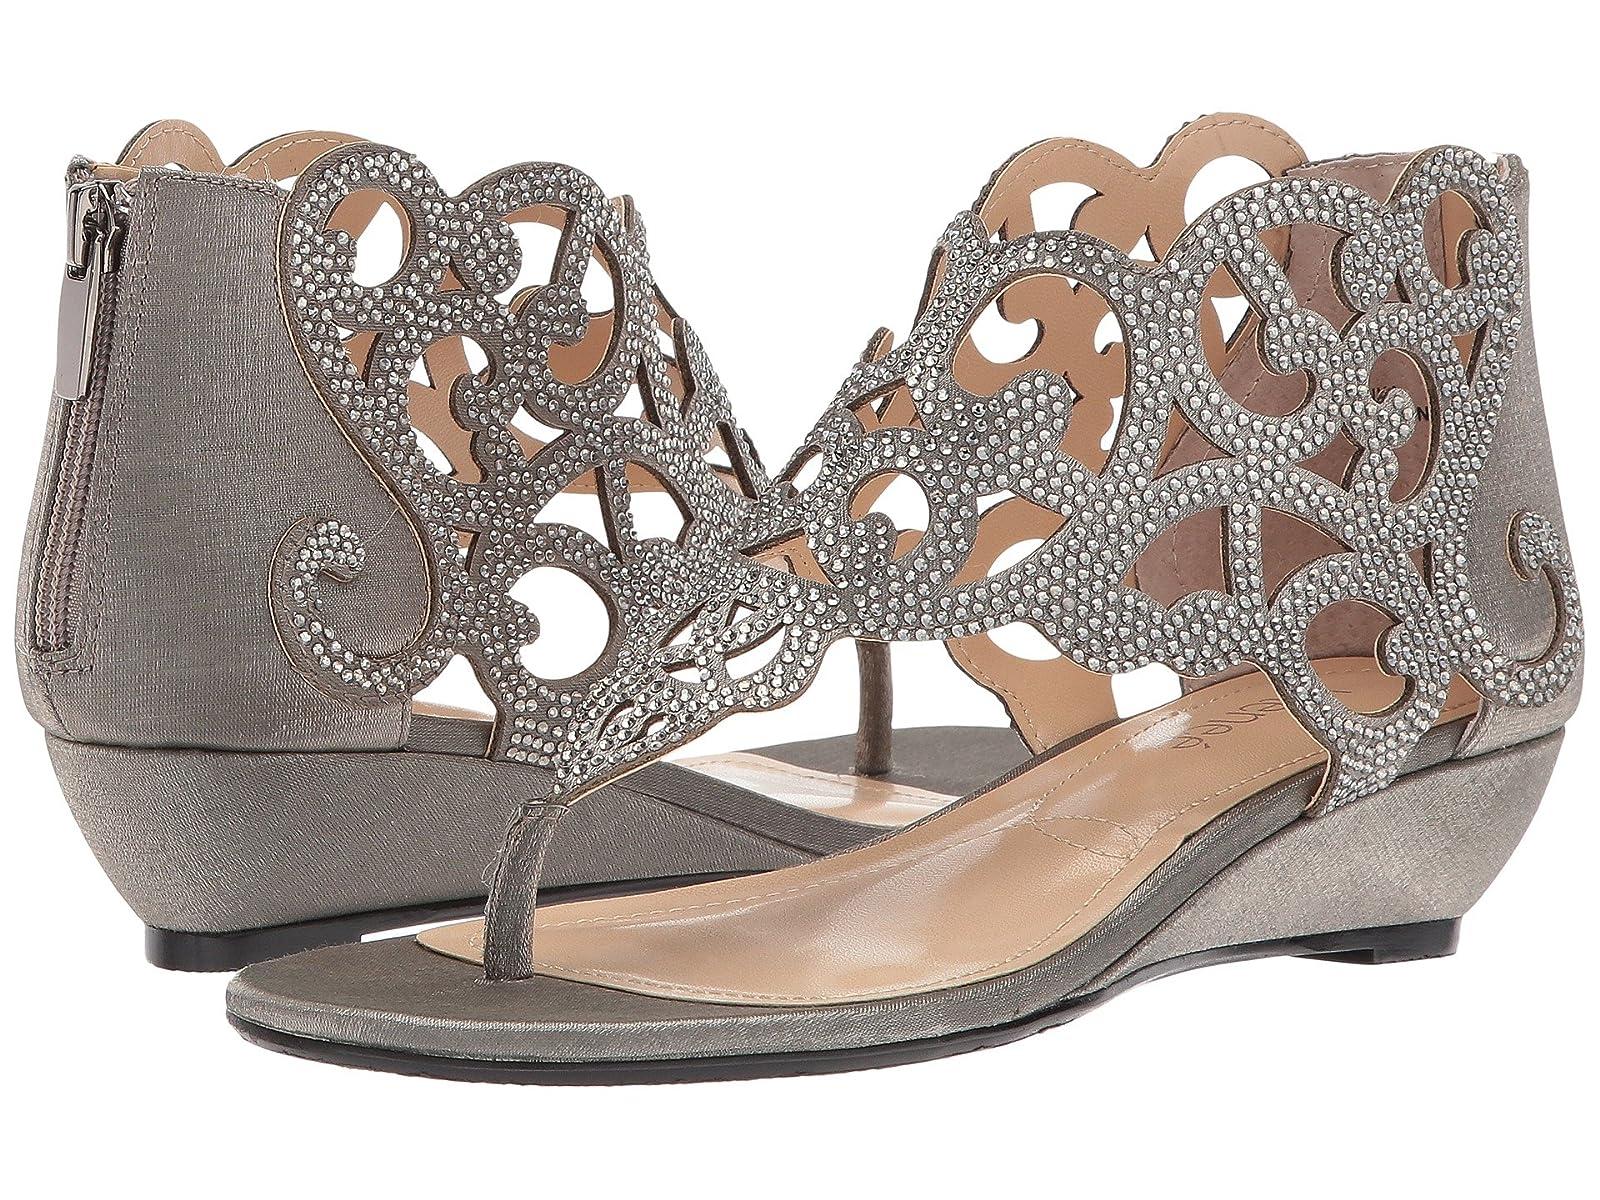 J. Renee MinkaCheap and distinctive eye-catching shoes